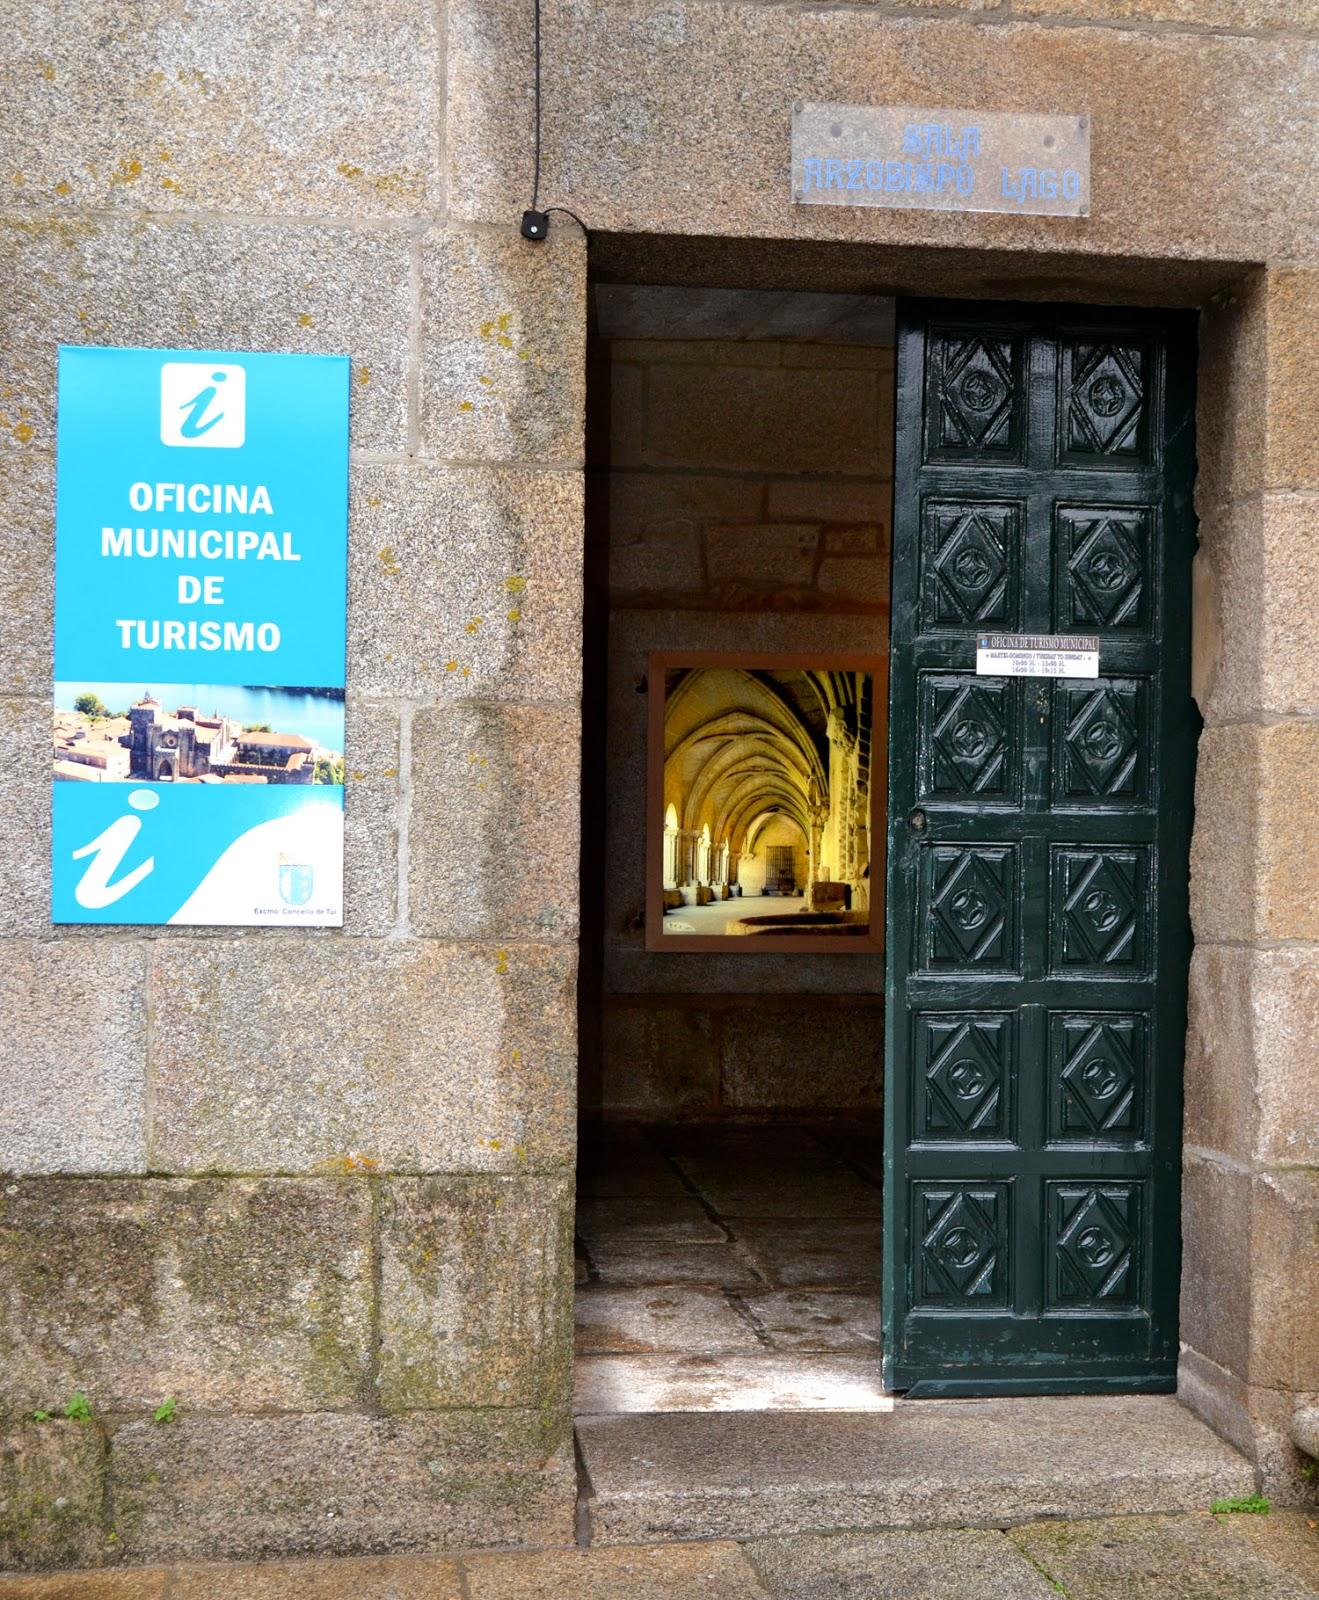 Valen a tui info a oficina municipal de turismo de tui for Oficina de turismo albarracin